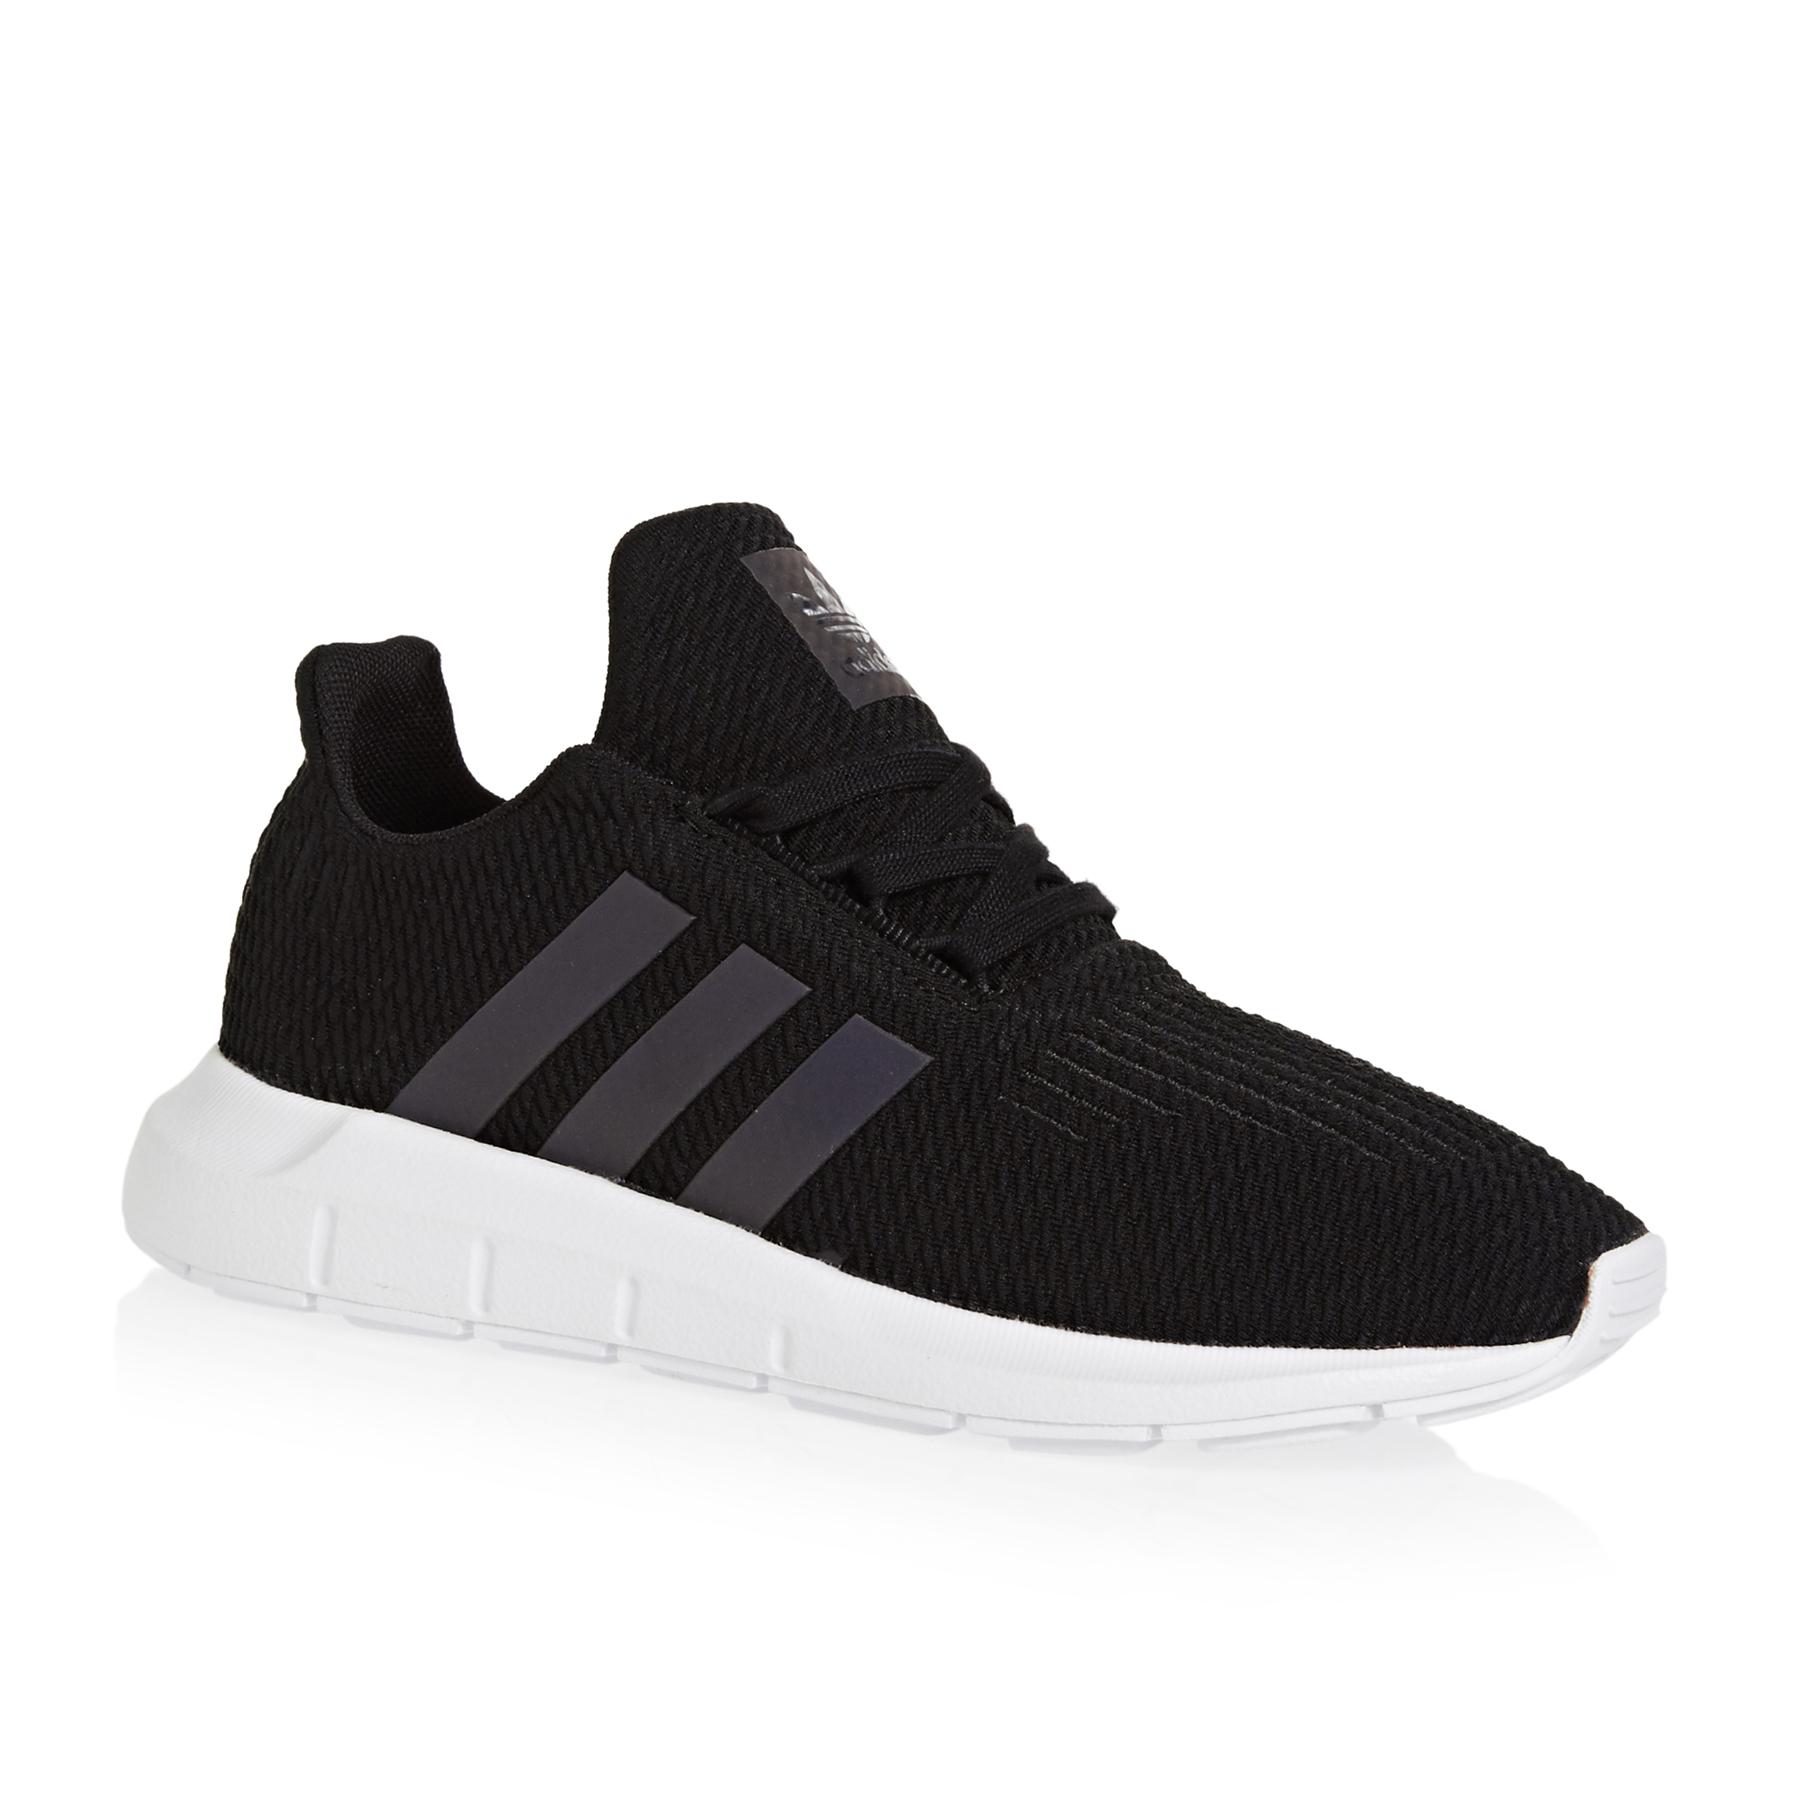 Details about adidas Originals Swift Run C BlackWhite Knit Junior Trainers Shoes